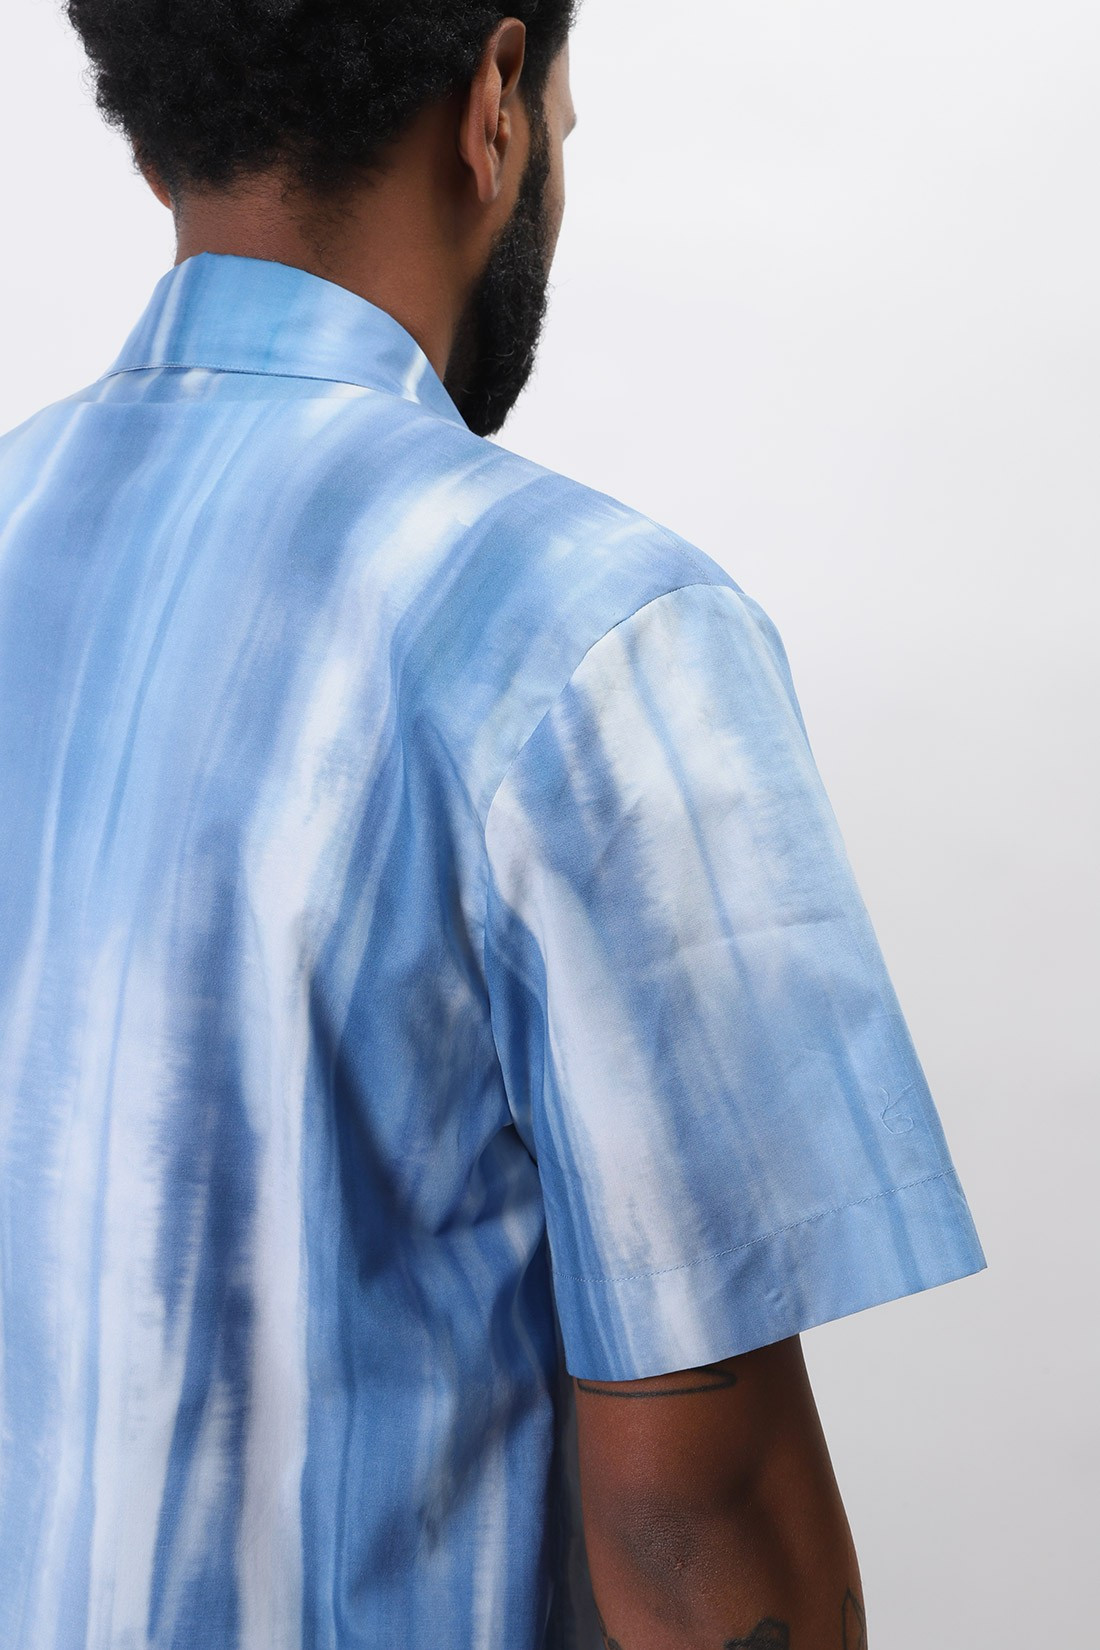 A.P.C. / Chemisette joseph Bleu